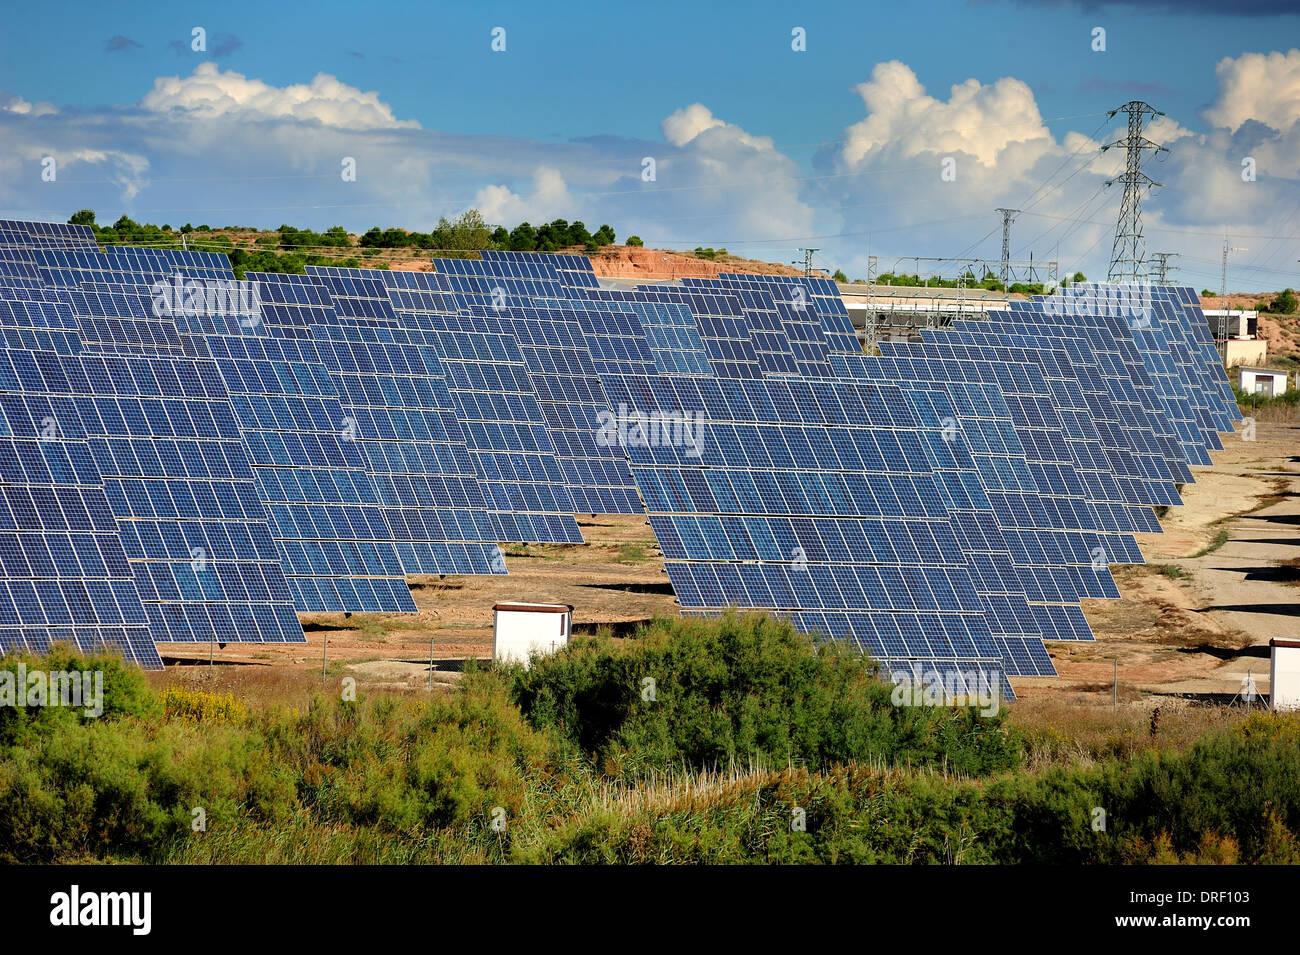 Planta de energía solar. Filas de paneles fotovoltaicos, La Rioja, España, Europa Imagen De Stock